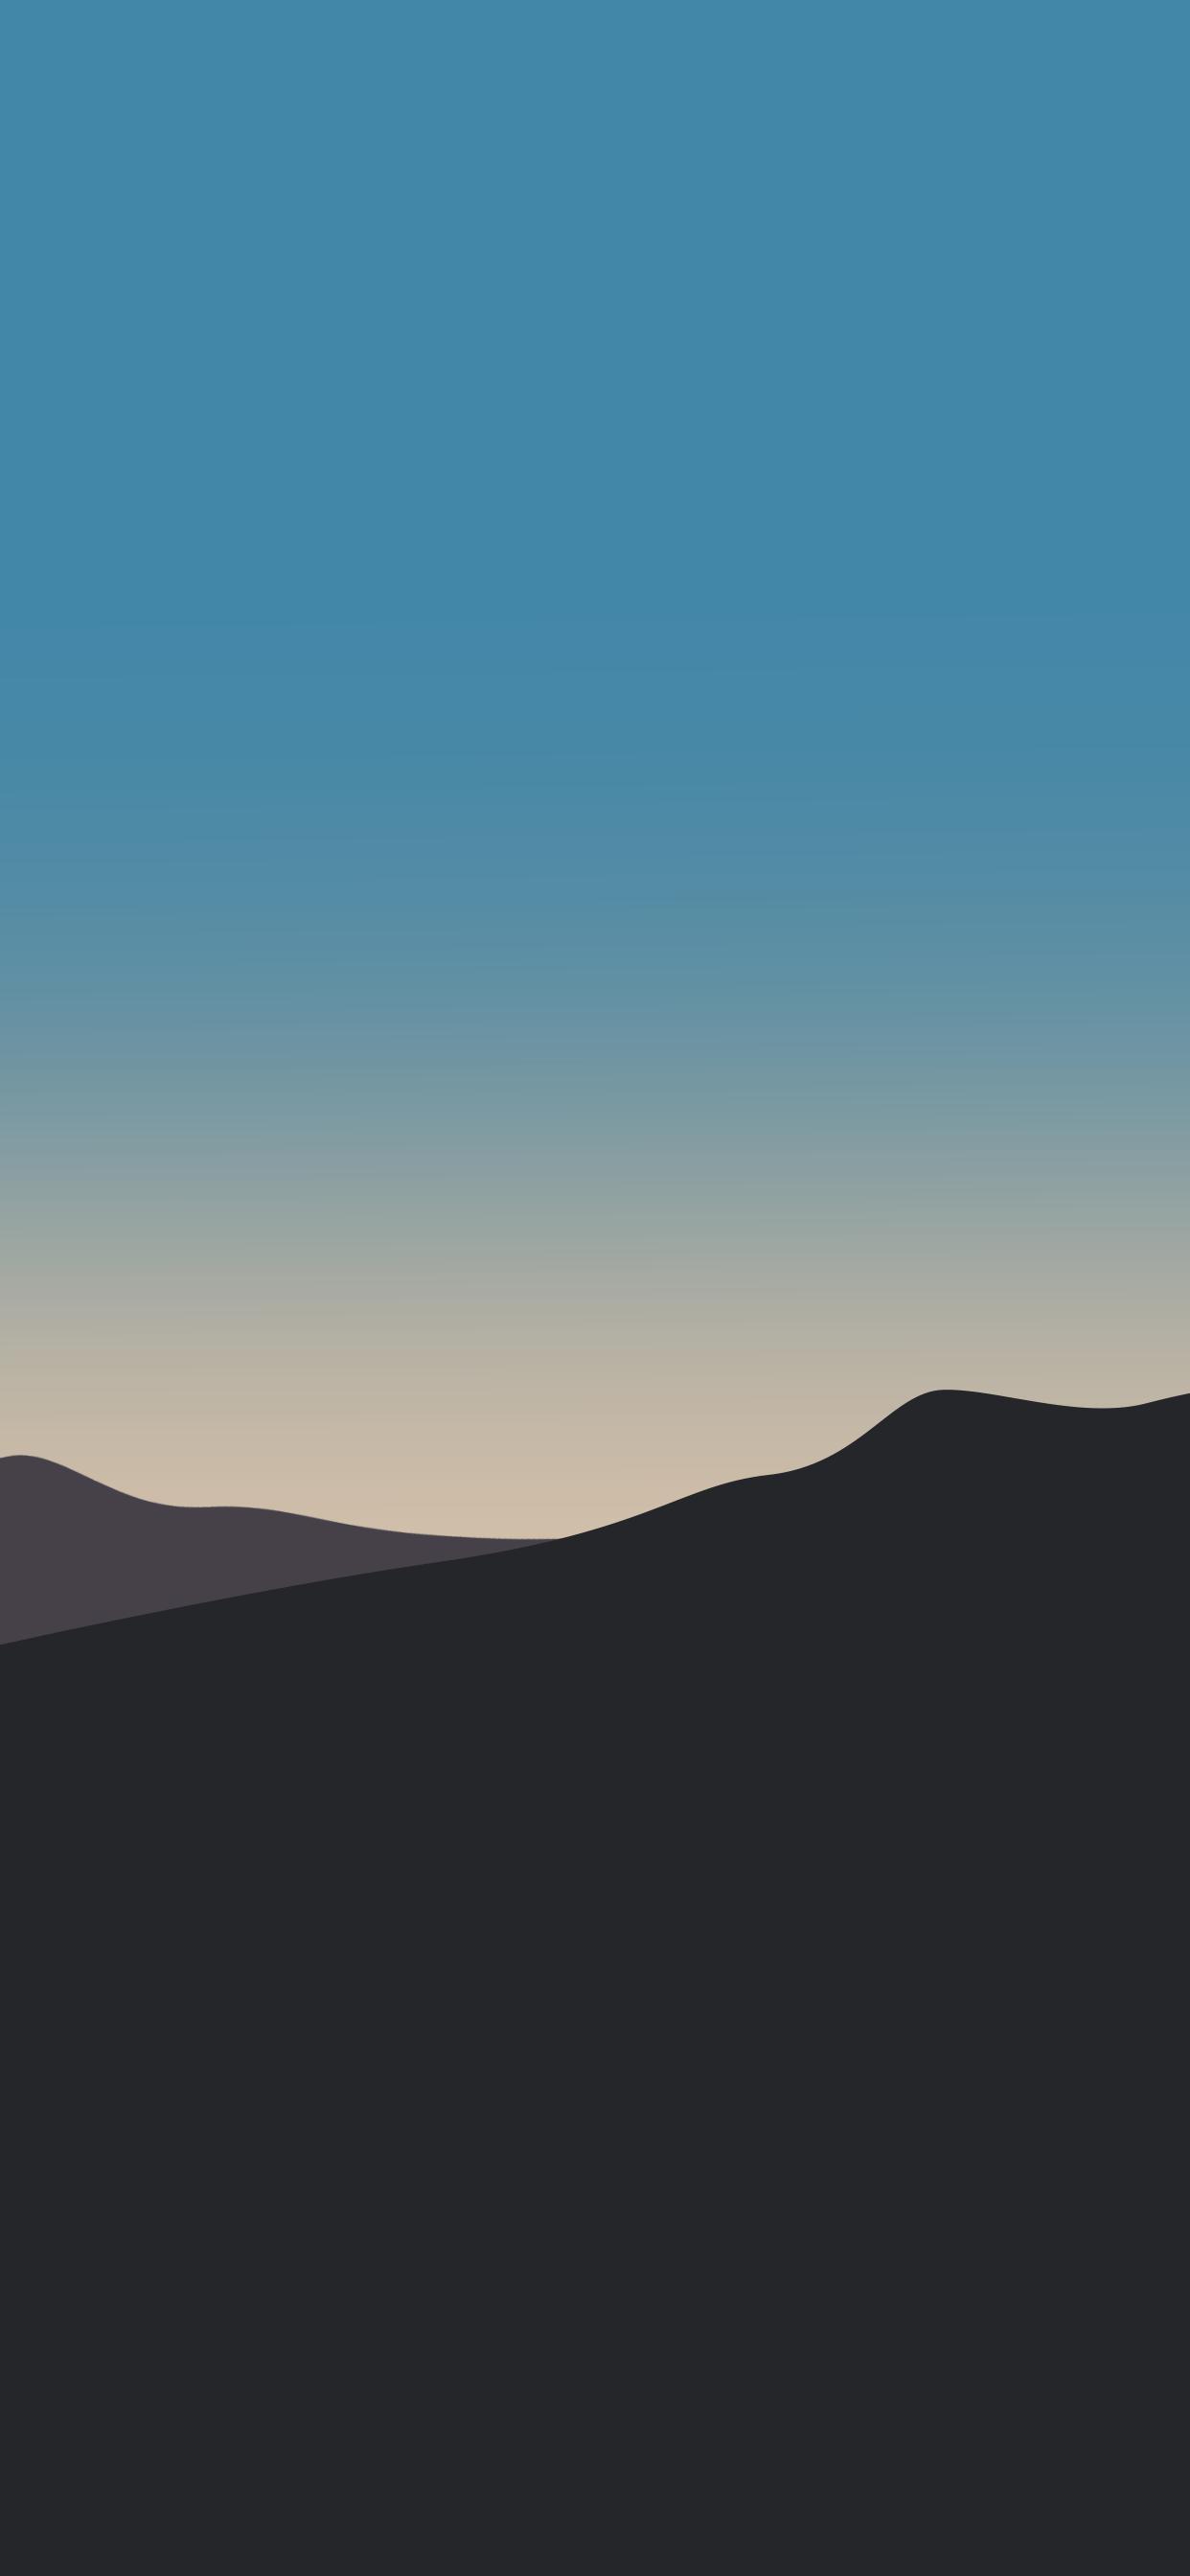 iPhone wallpaper illustration sunrise Illustration